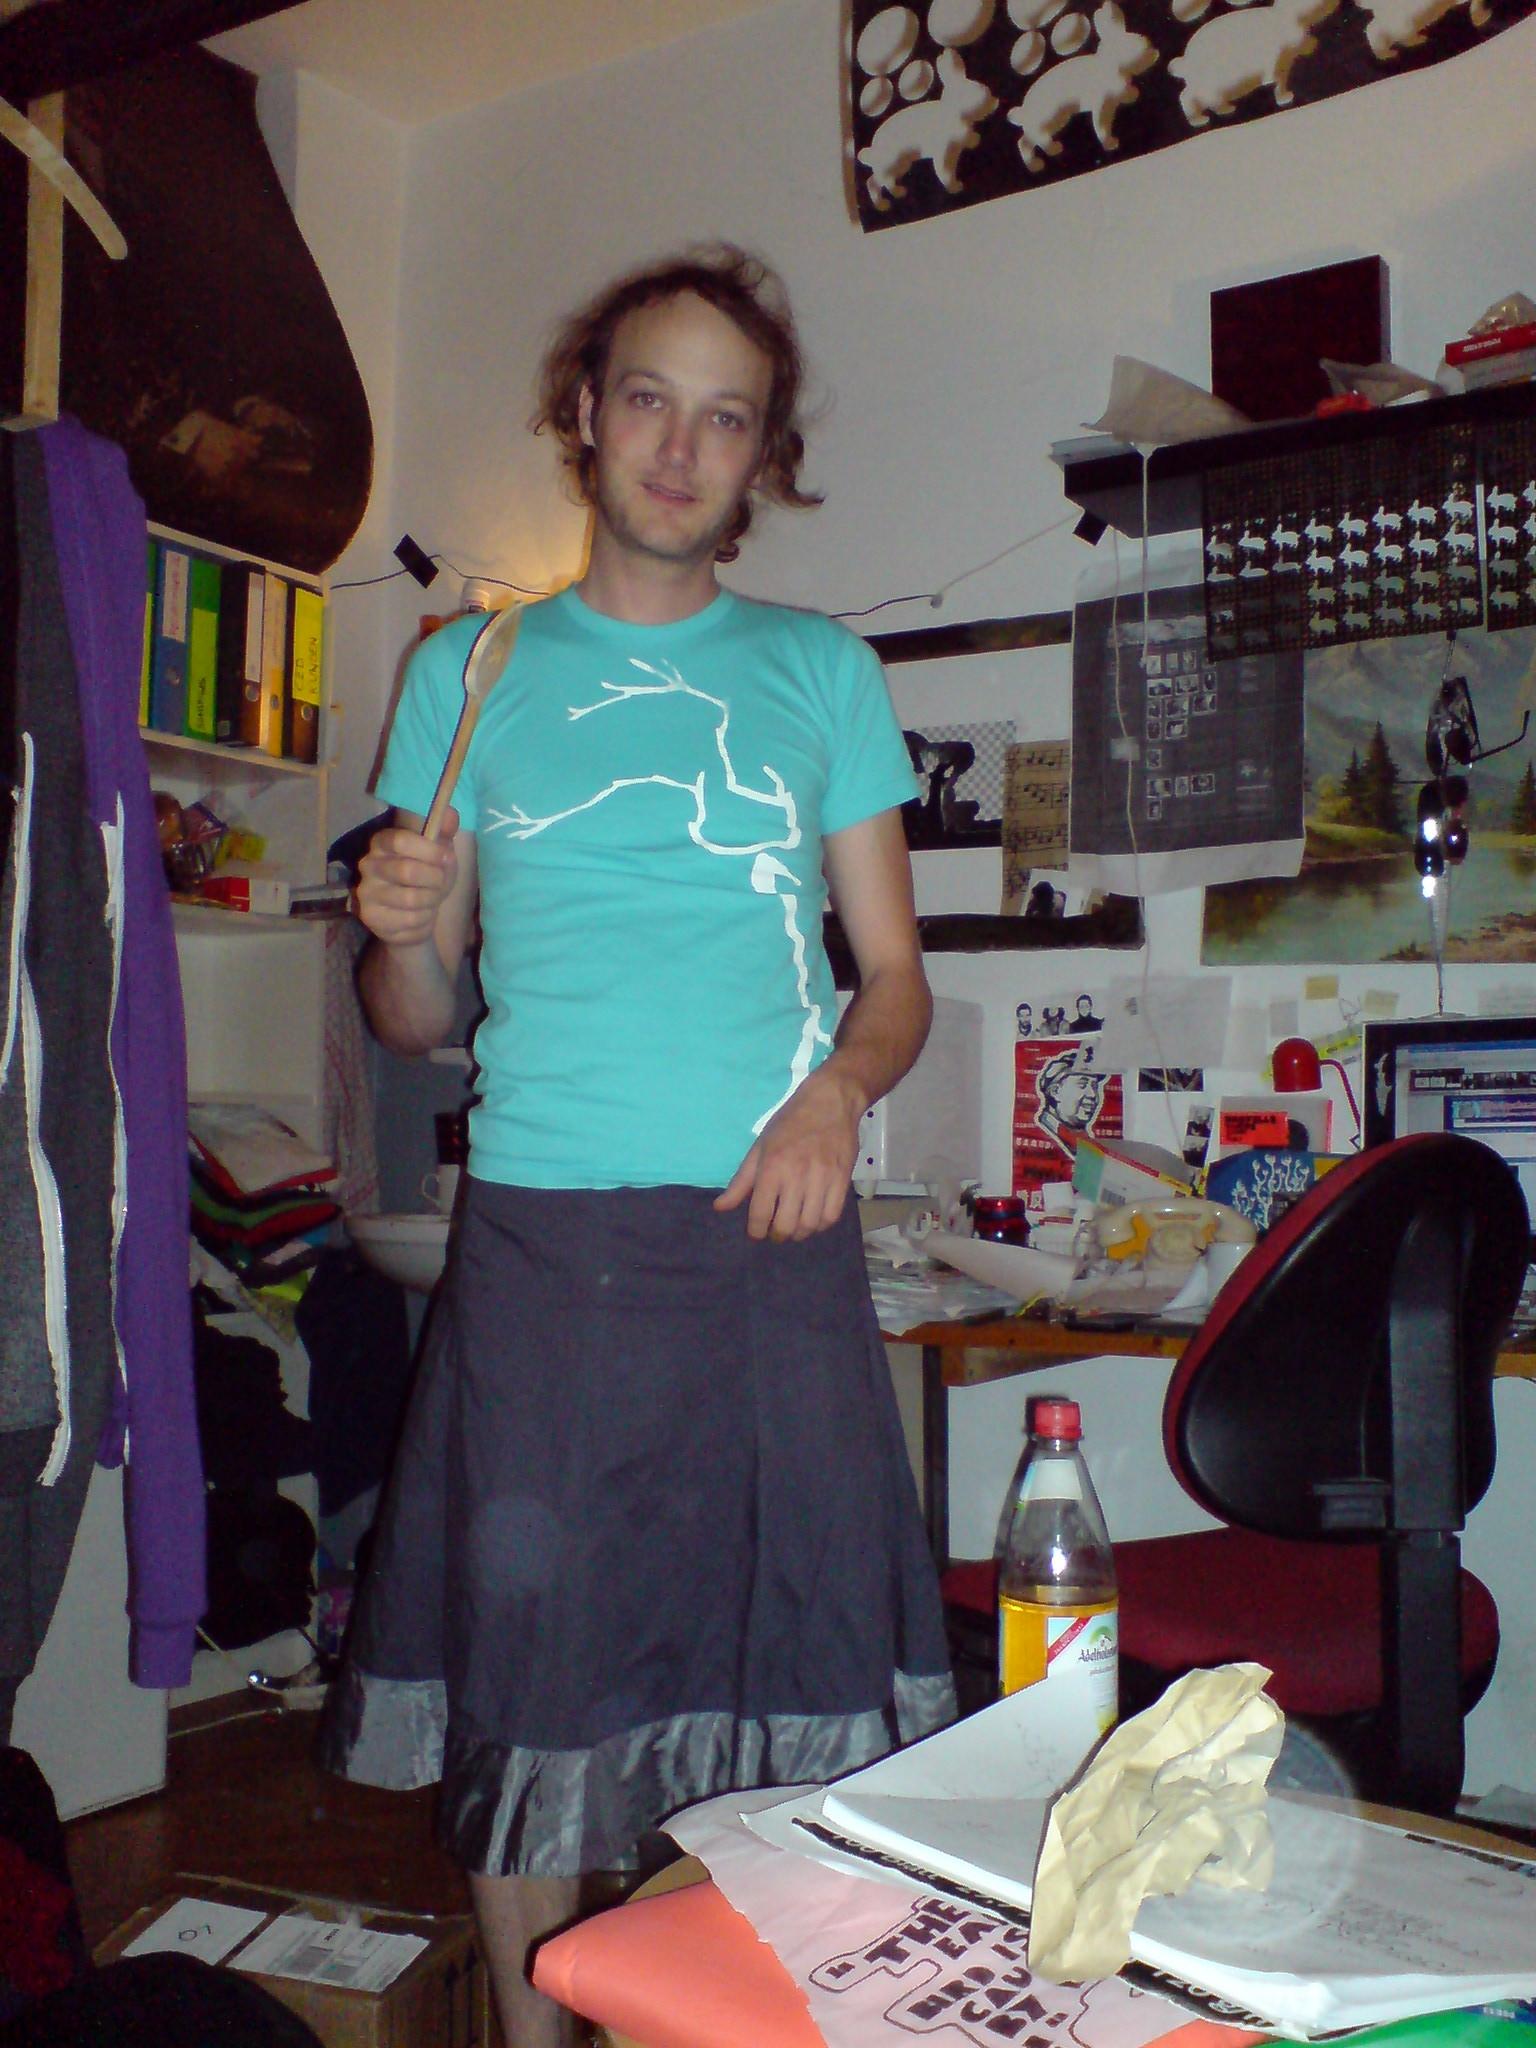 Startup anno 2007! ;-) The early days of ThokkThokk.